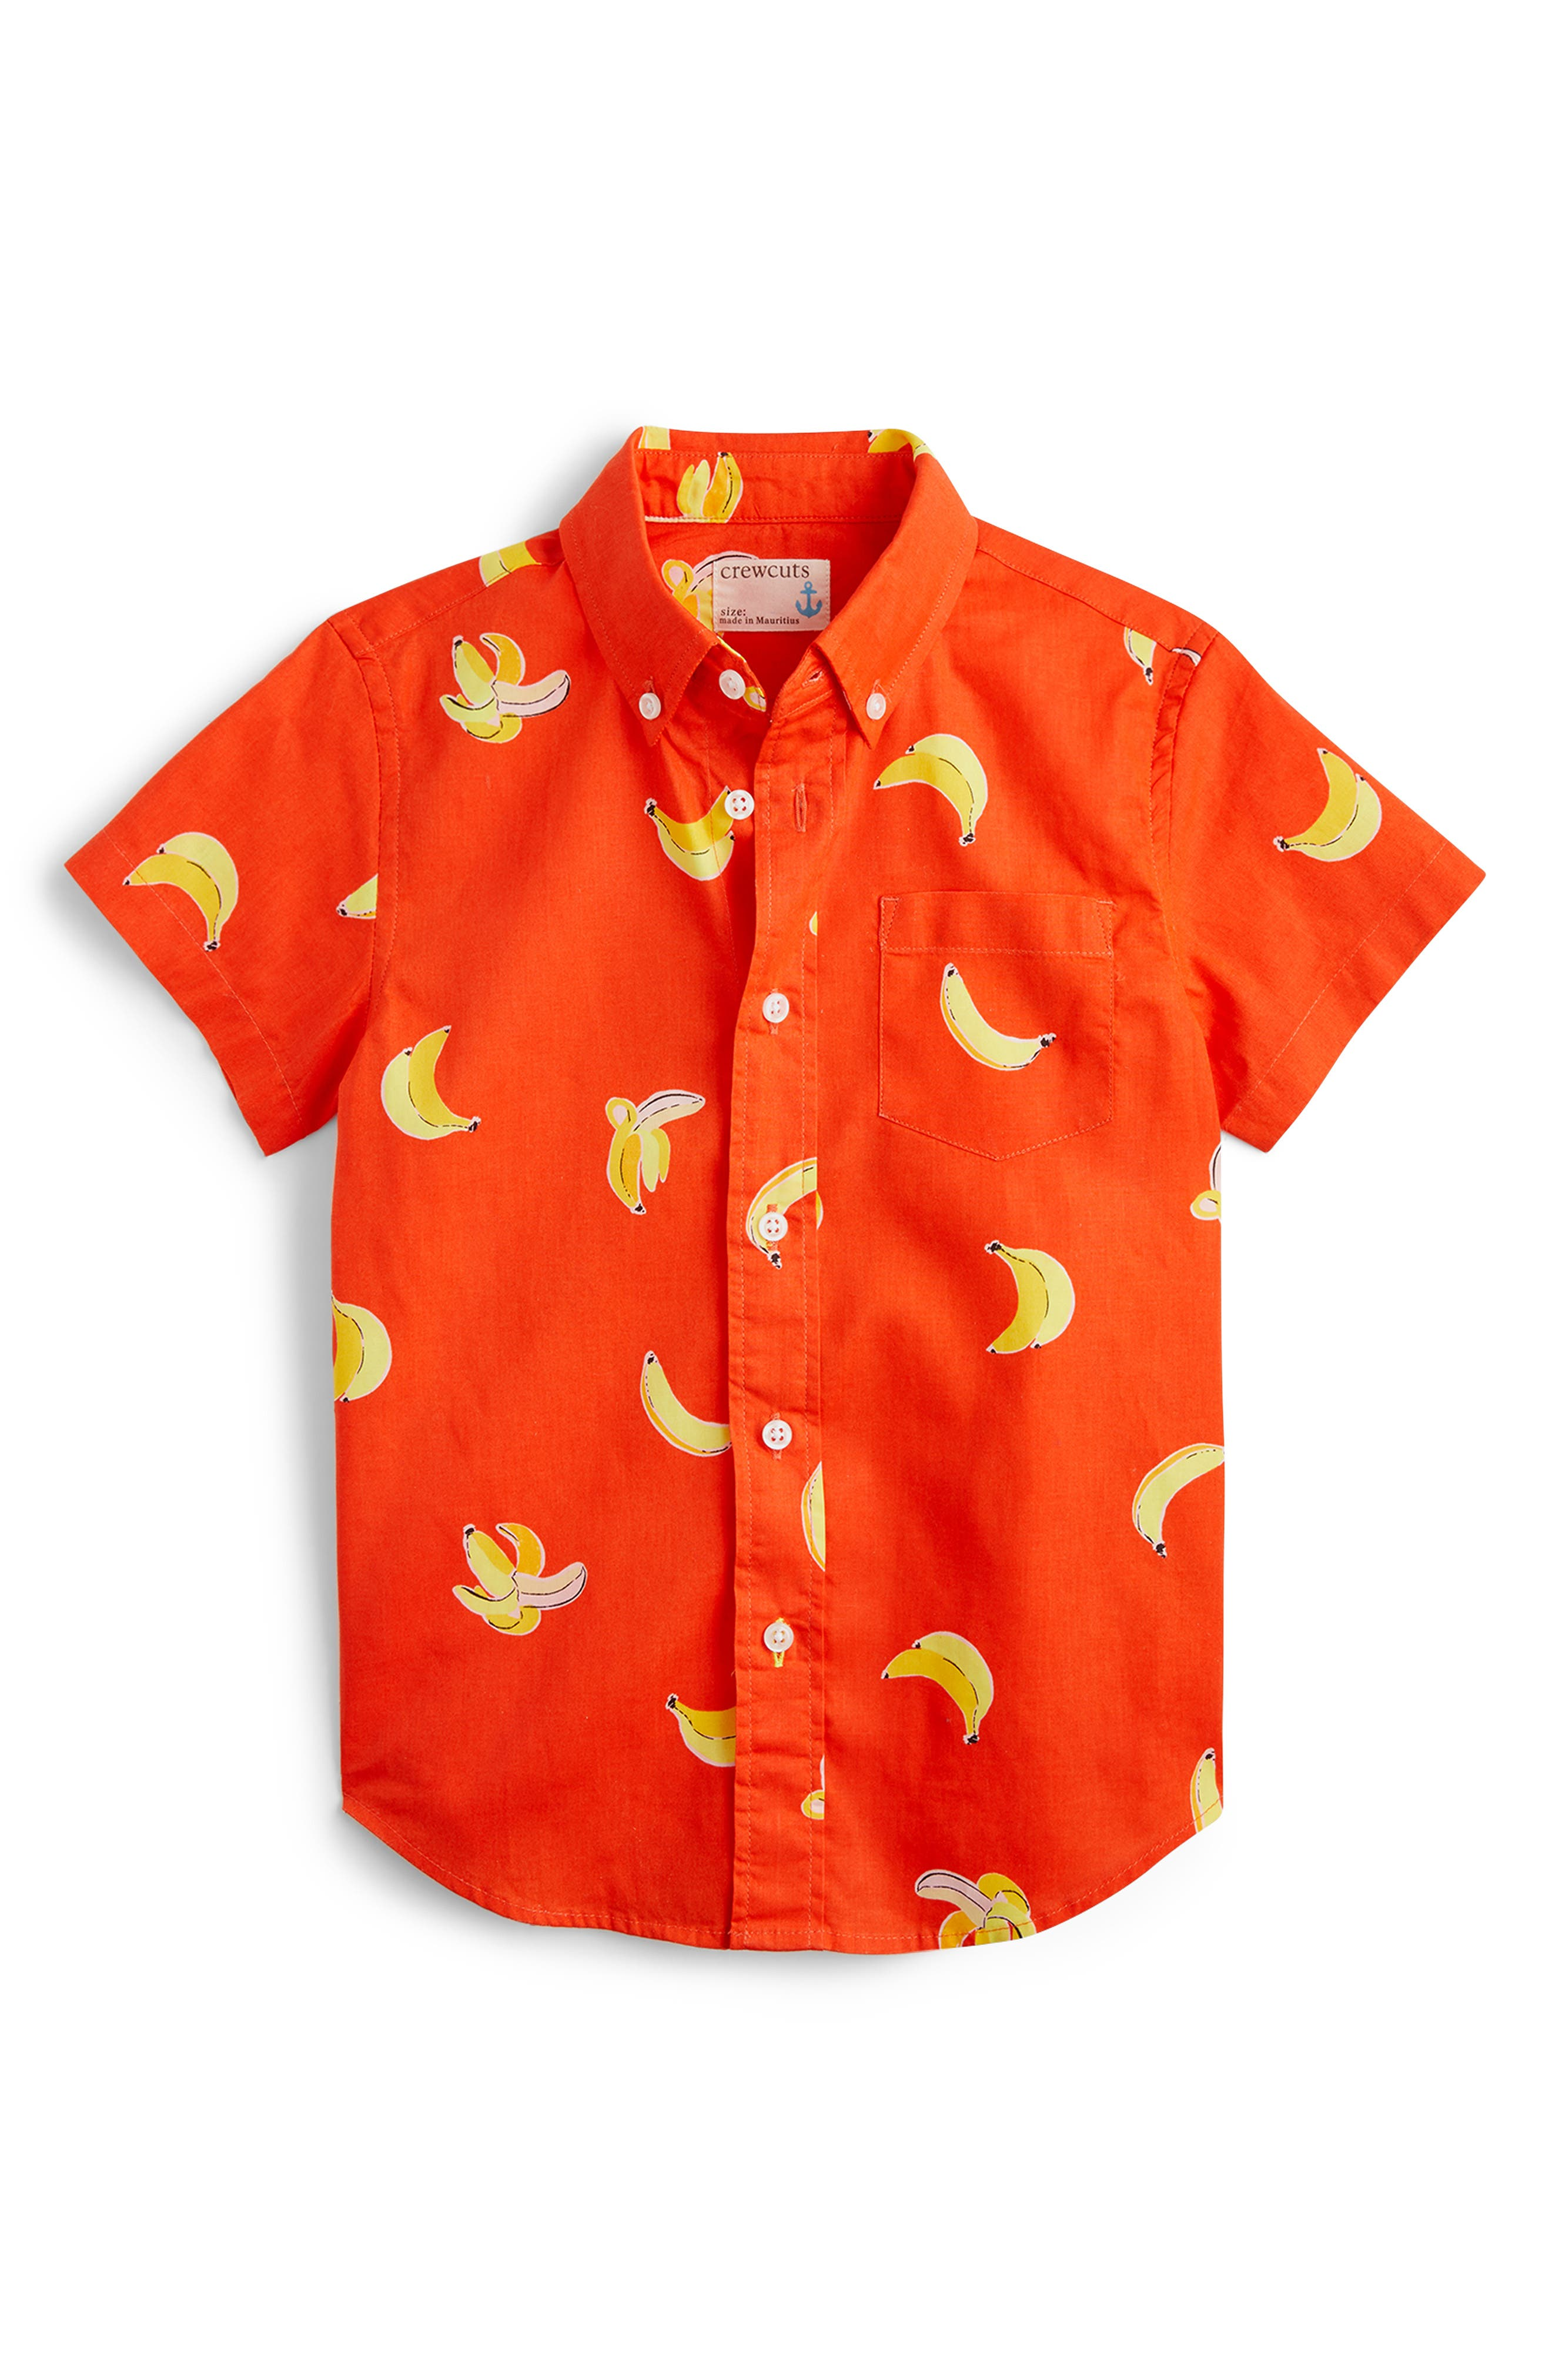 Boys Crewcuts By Jcrew Bananas Stretch Poplin ButtonDown Shirt Size 67  Red